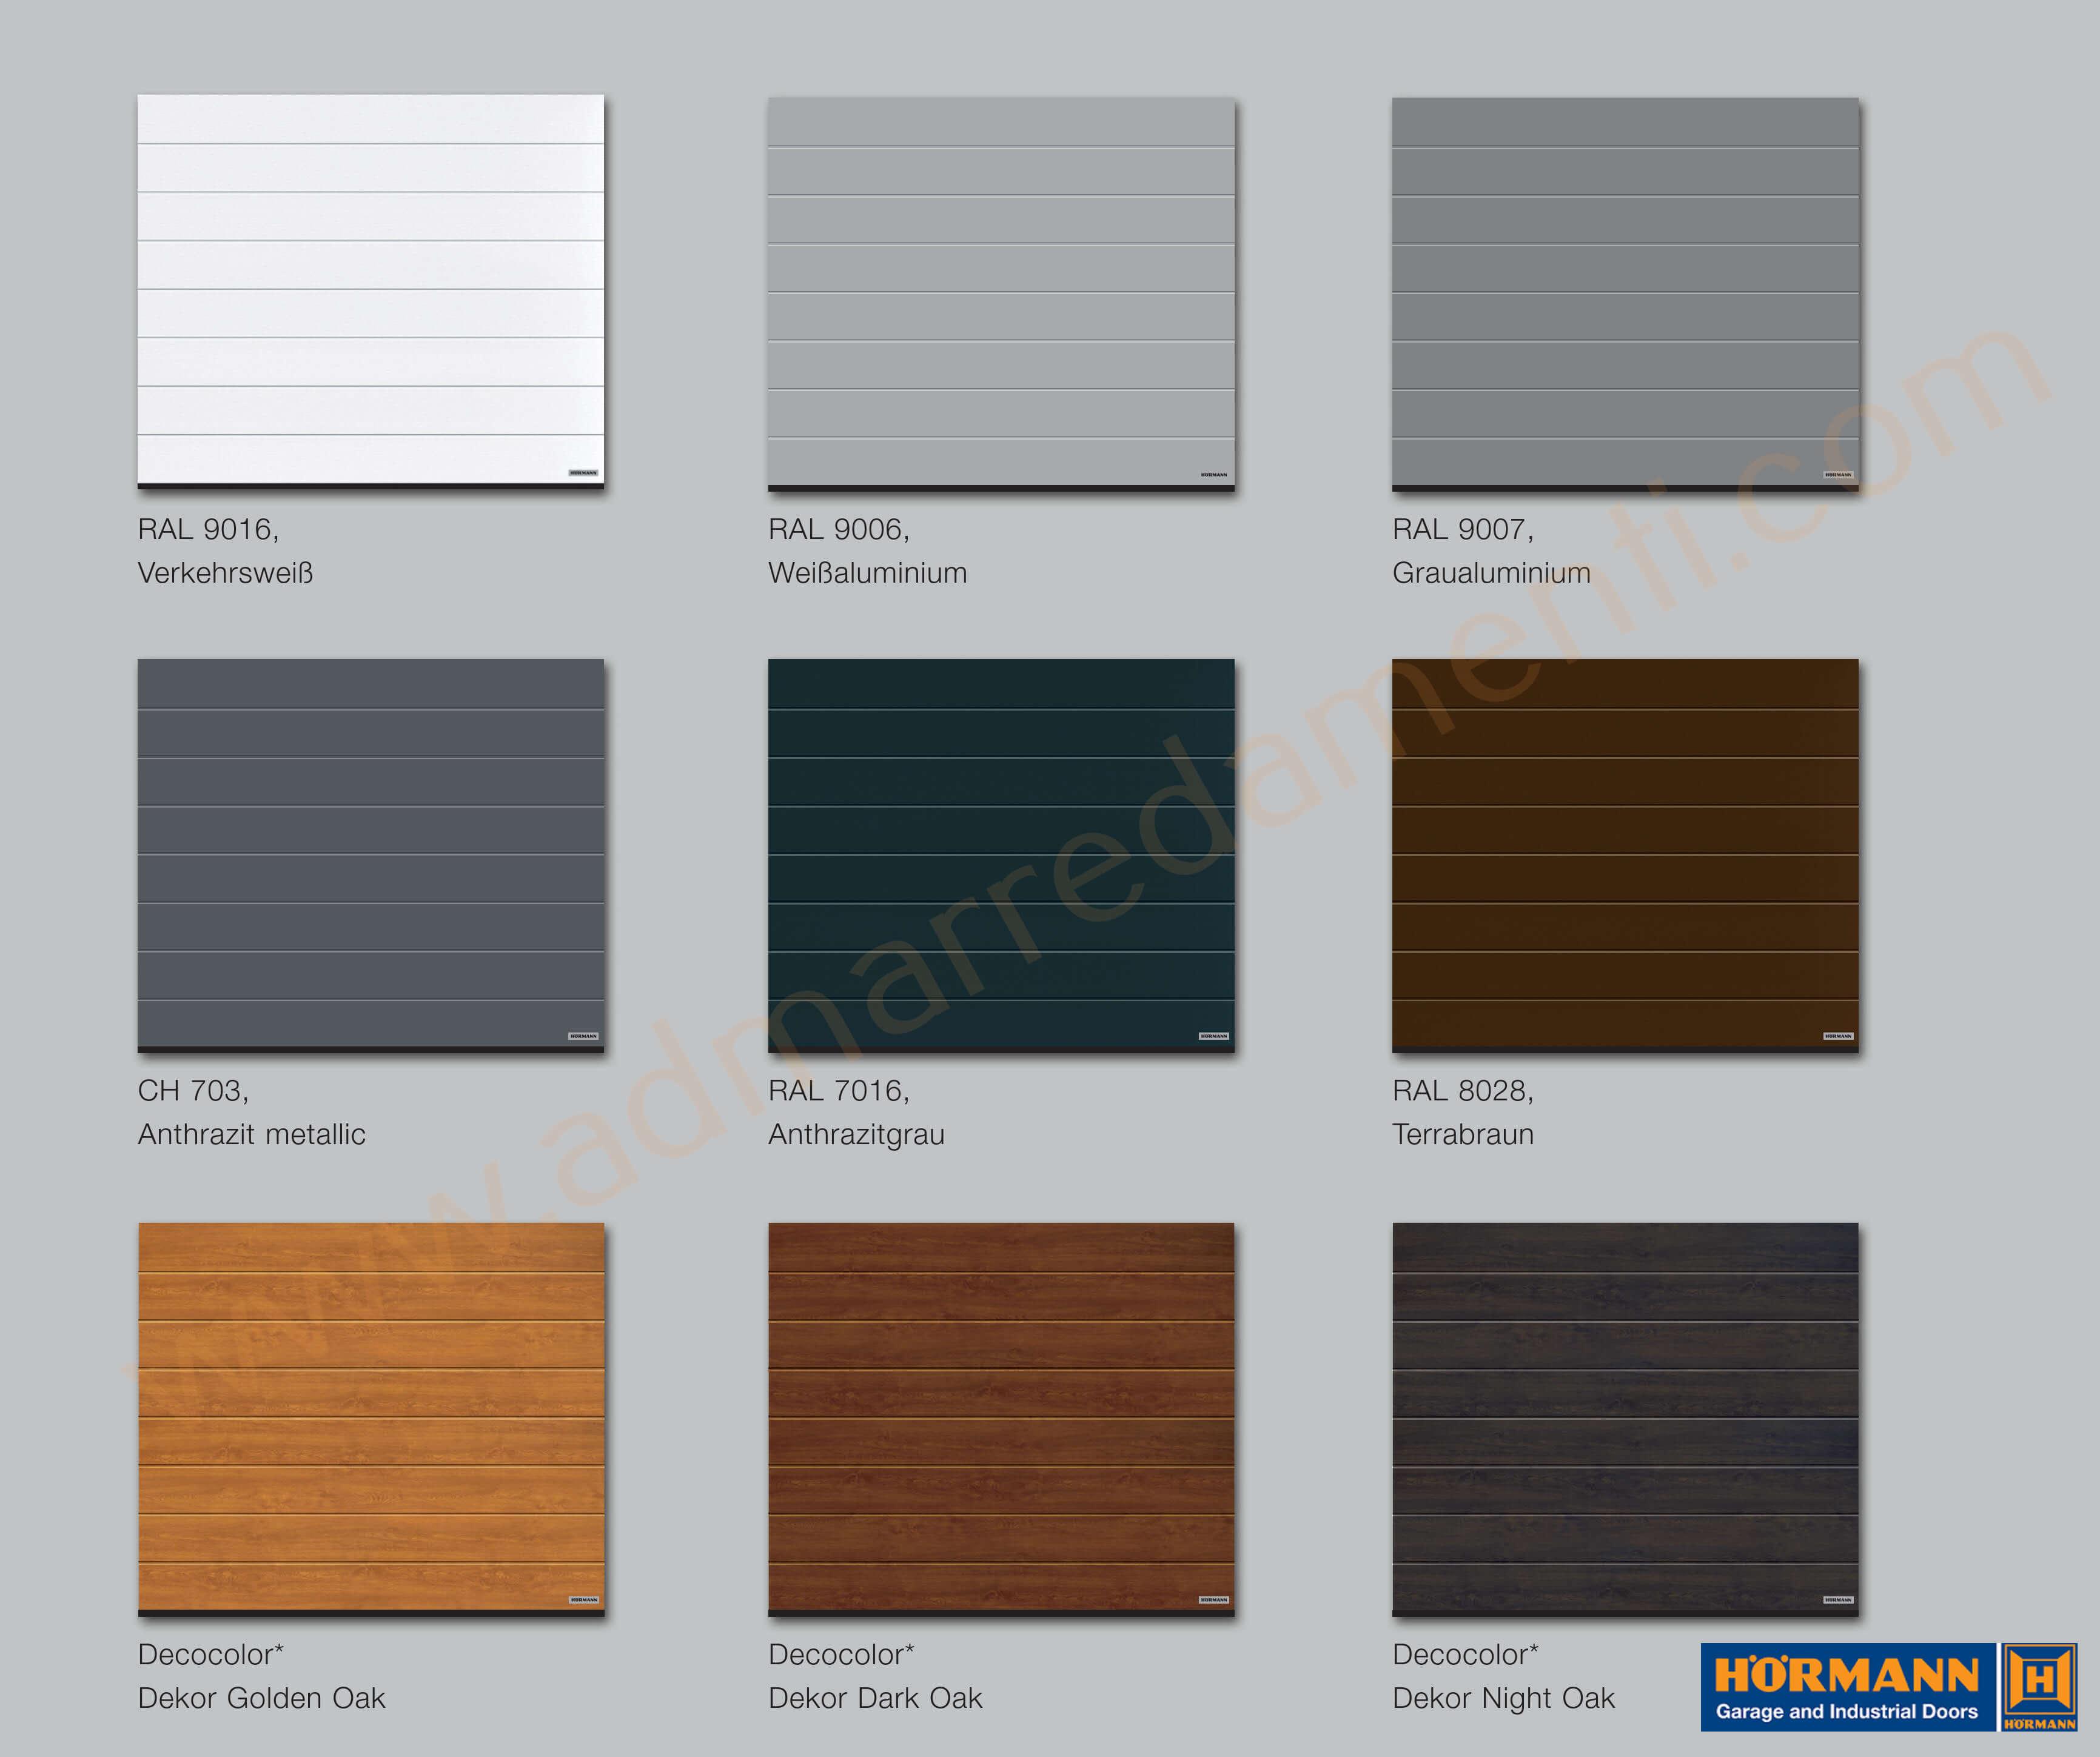 colore woodgrain greca M